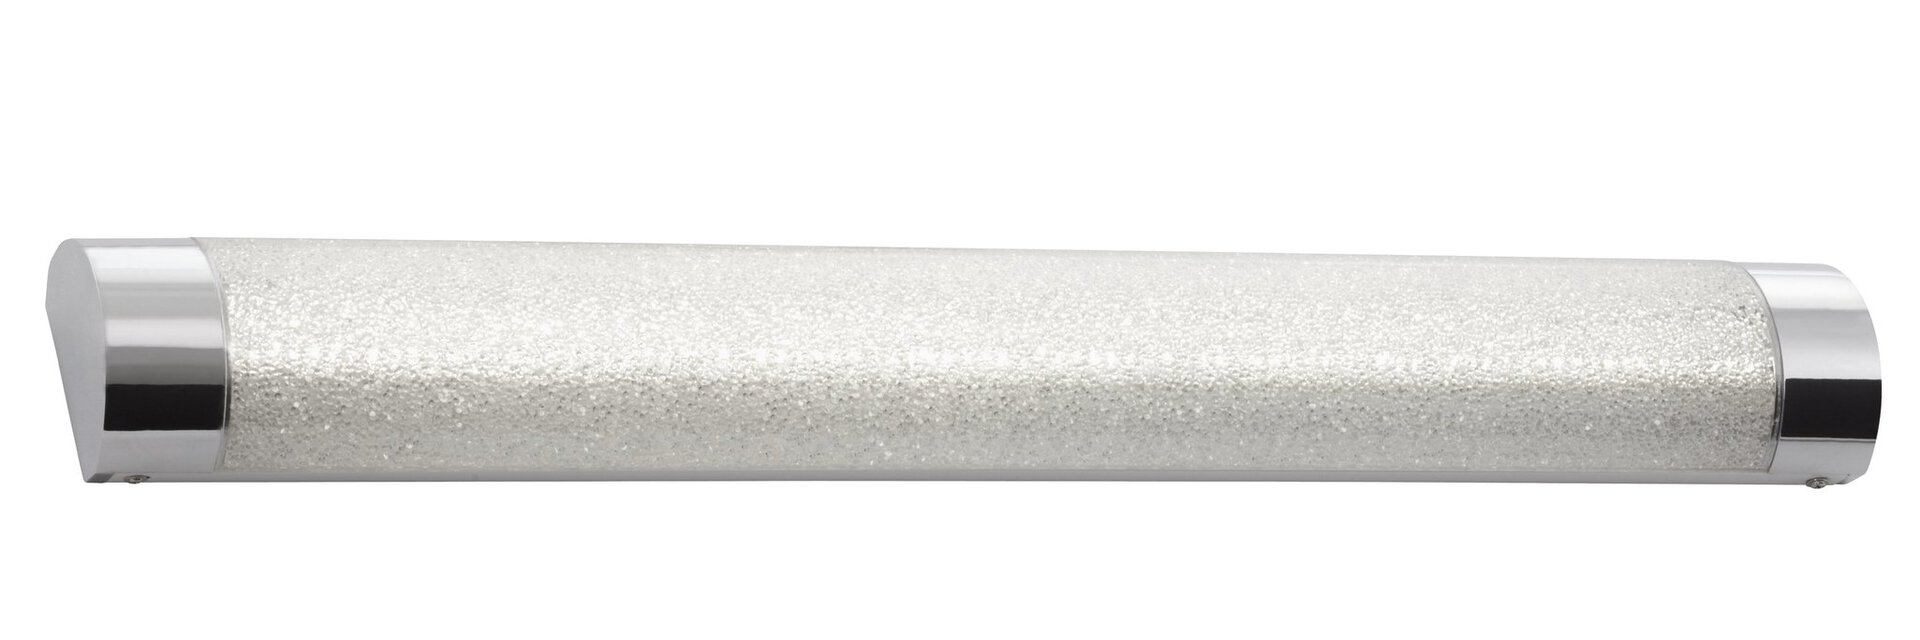 Bad-Wandleuchte Brilo Bath Briloner Metall silber 9 x 5 x 62 cm